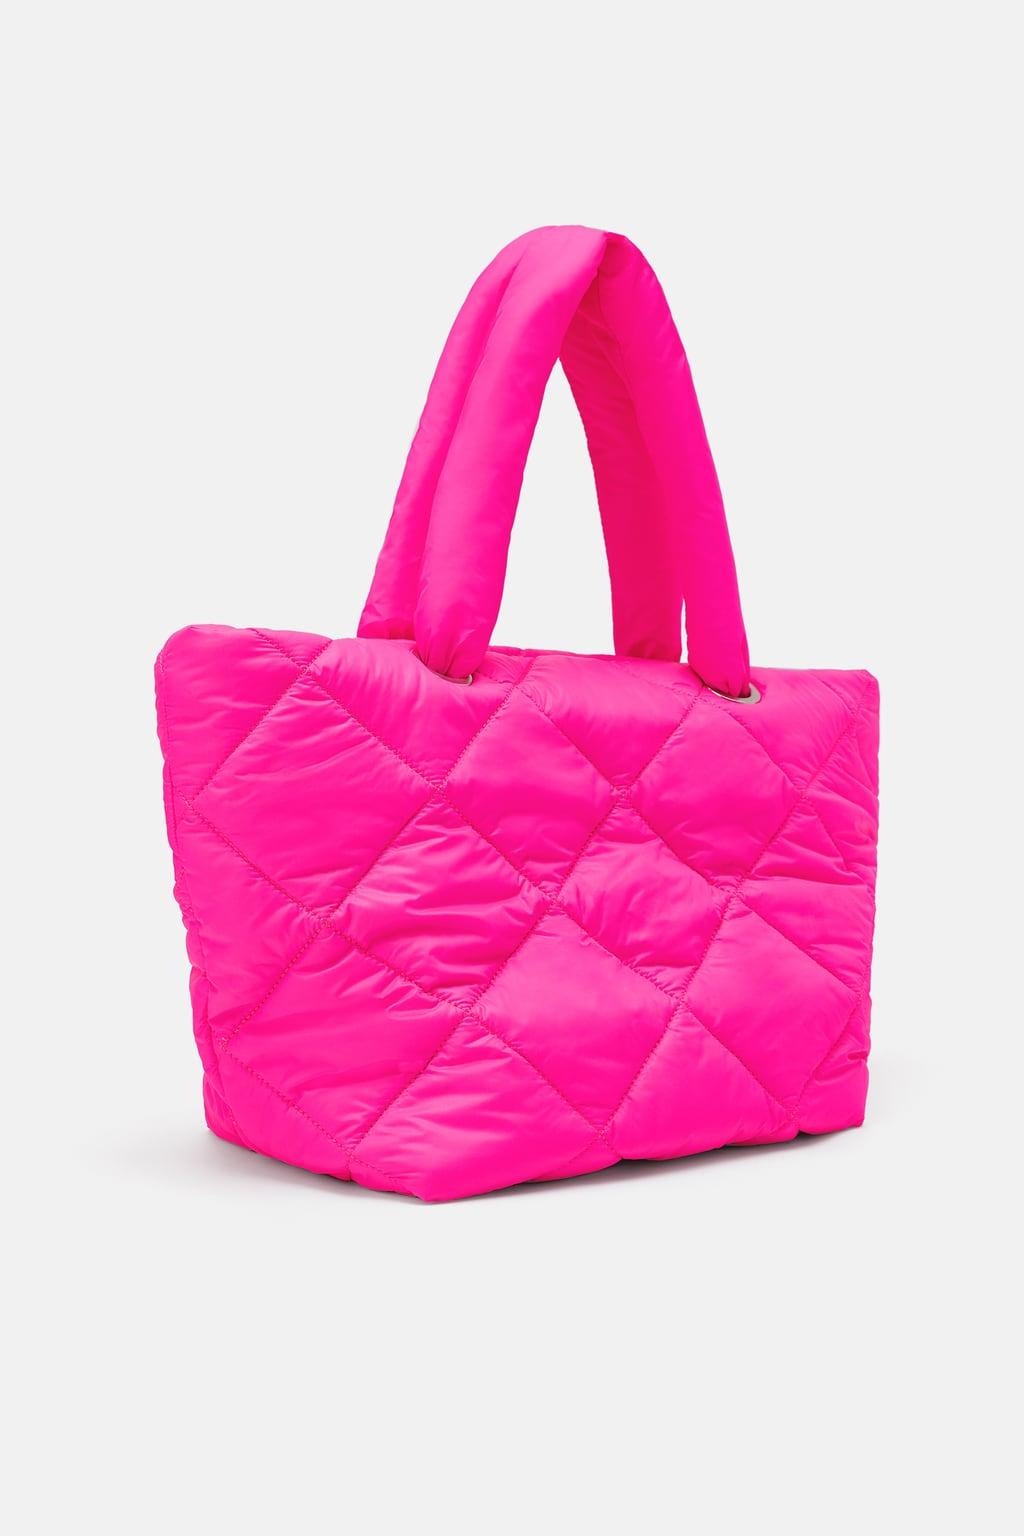 Our Everyday Diaper Bag